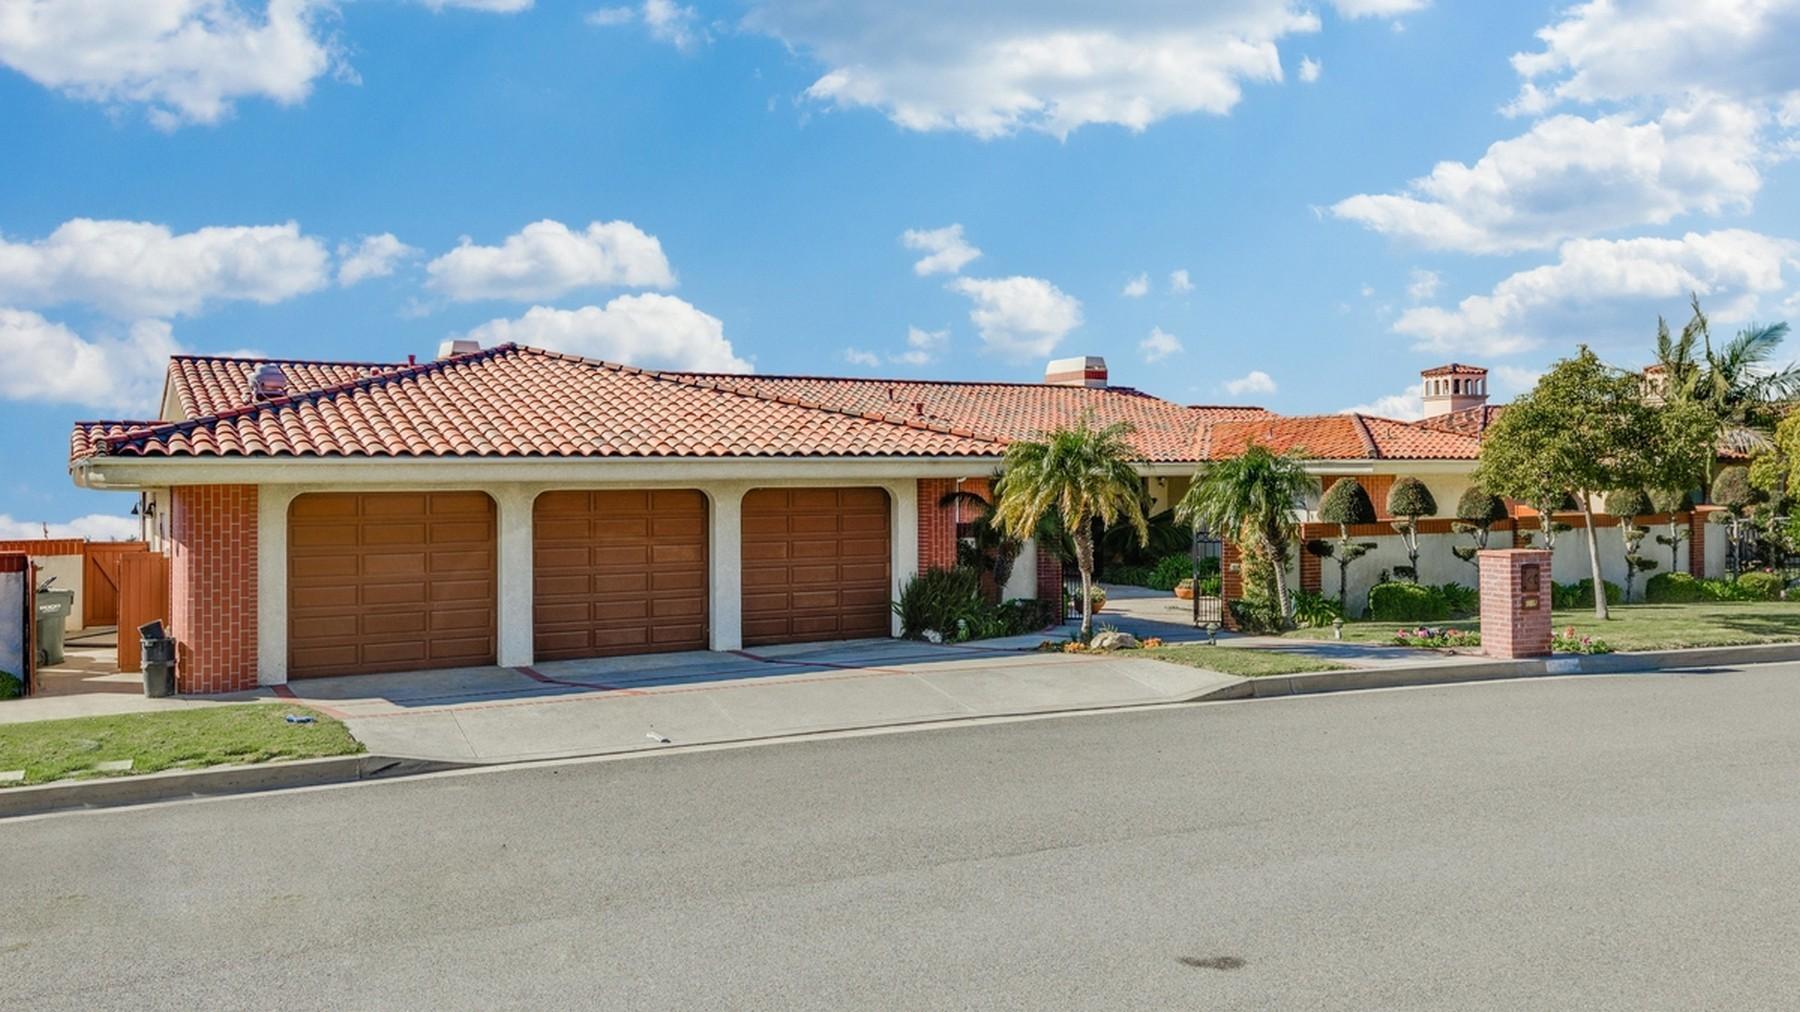 Property For Sale at 30657 Calle De Suenos